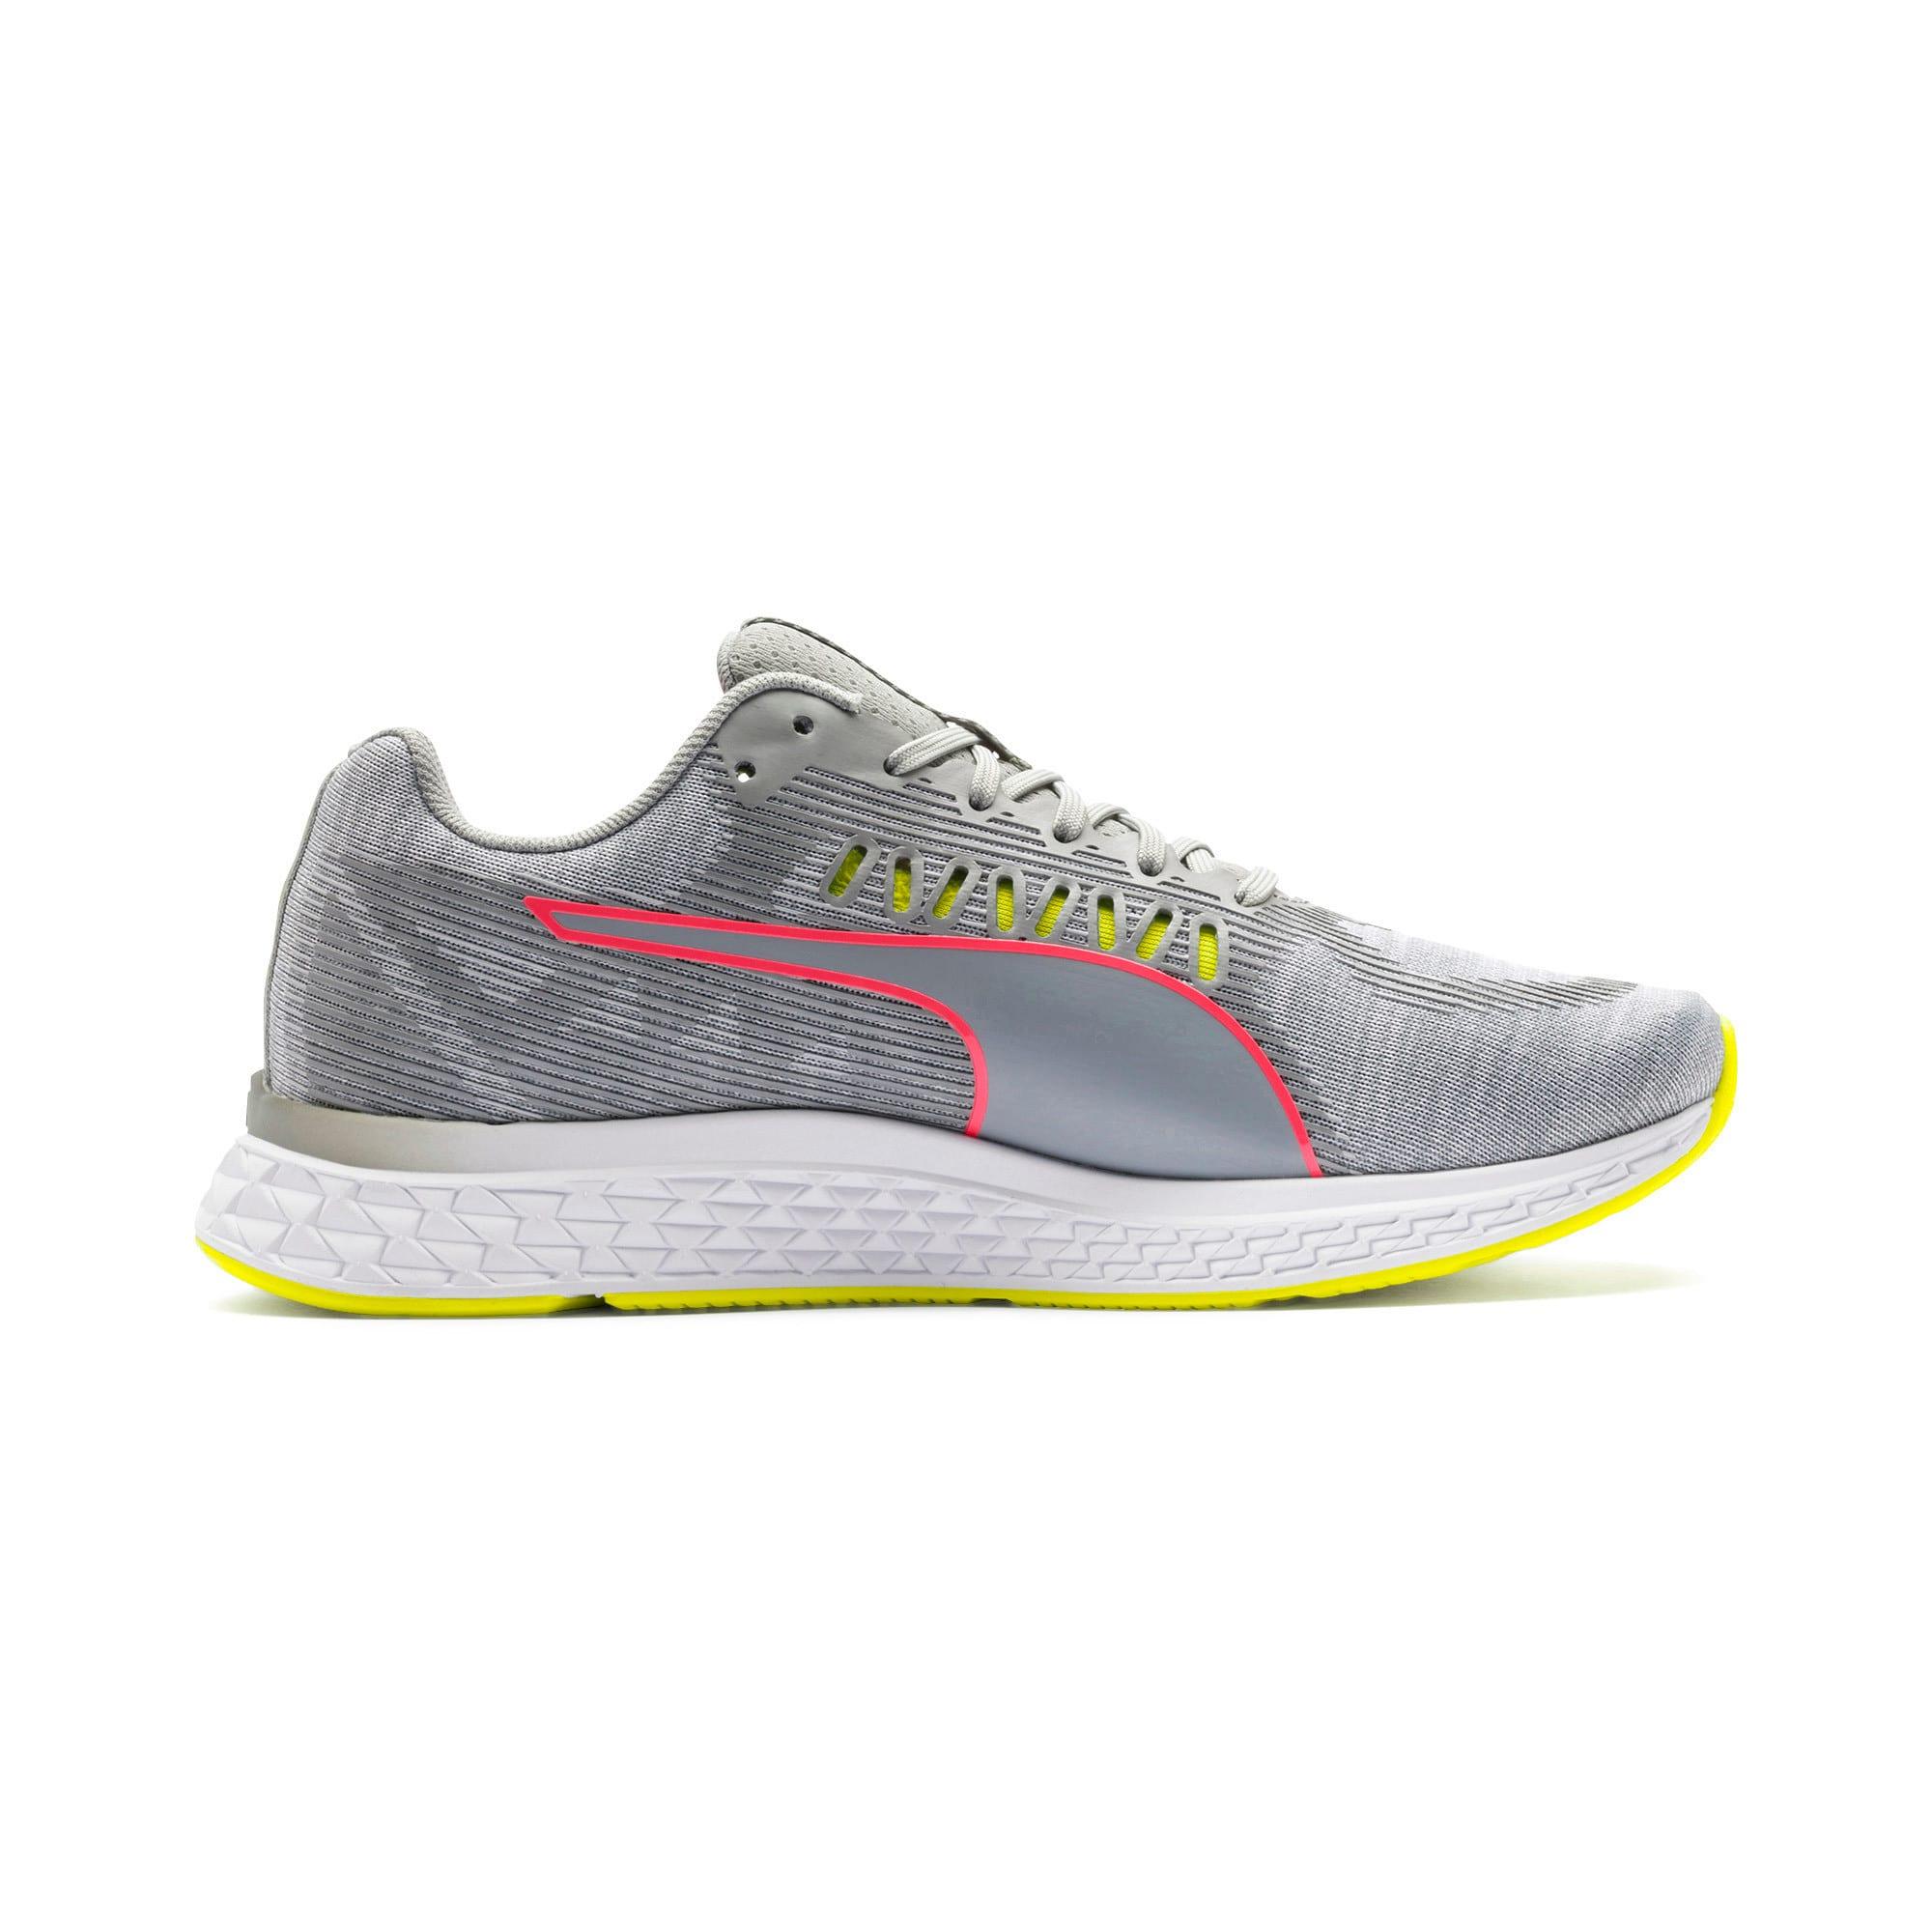 Imagen en miniatura 6 de Zapatillas de running de mujer Speed Sutamina, Quarry-Yellow Alert-Pink, mediana